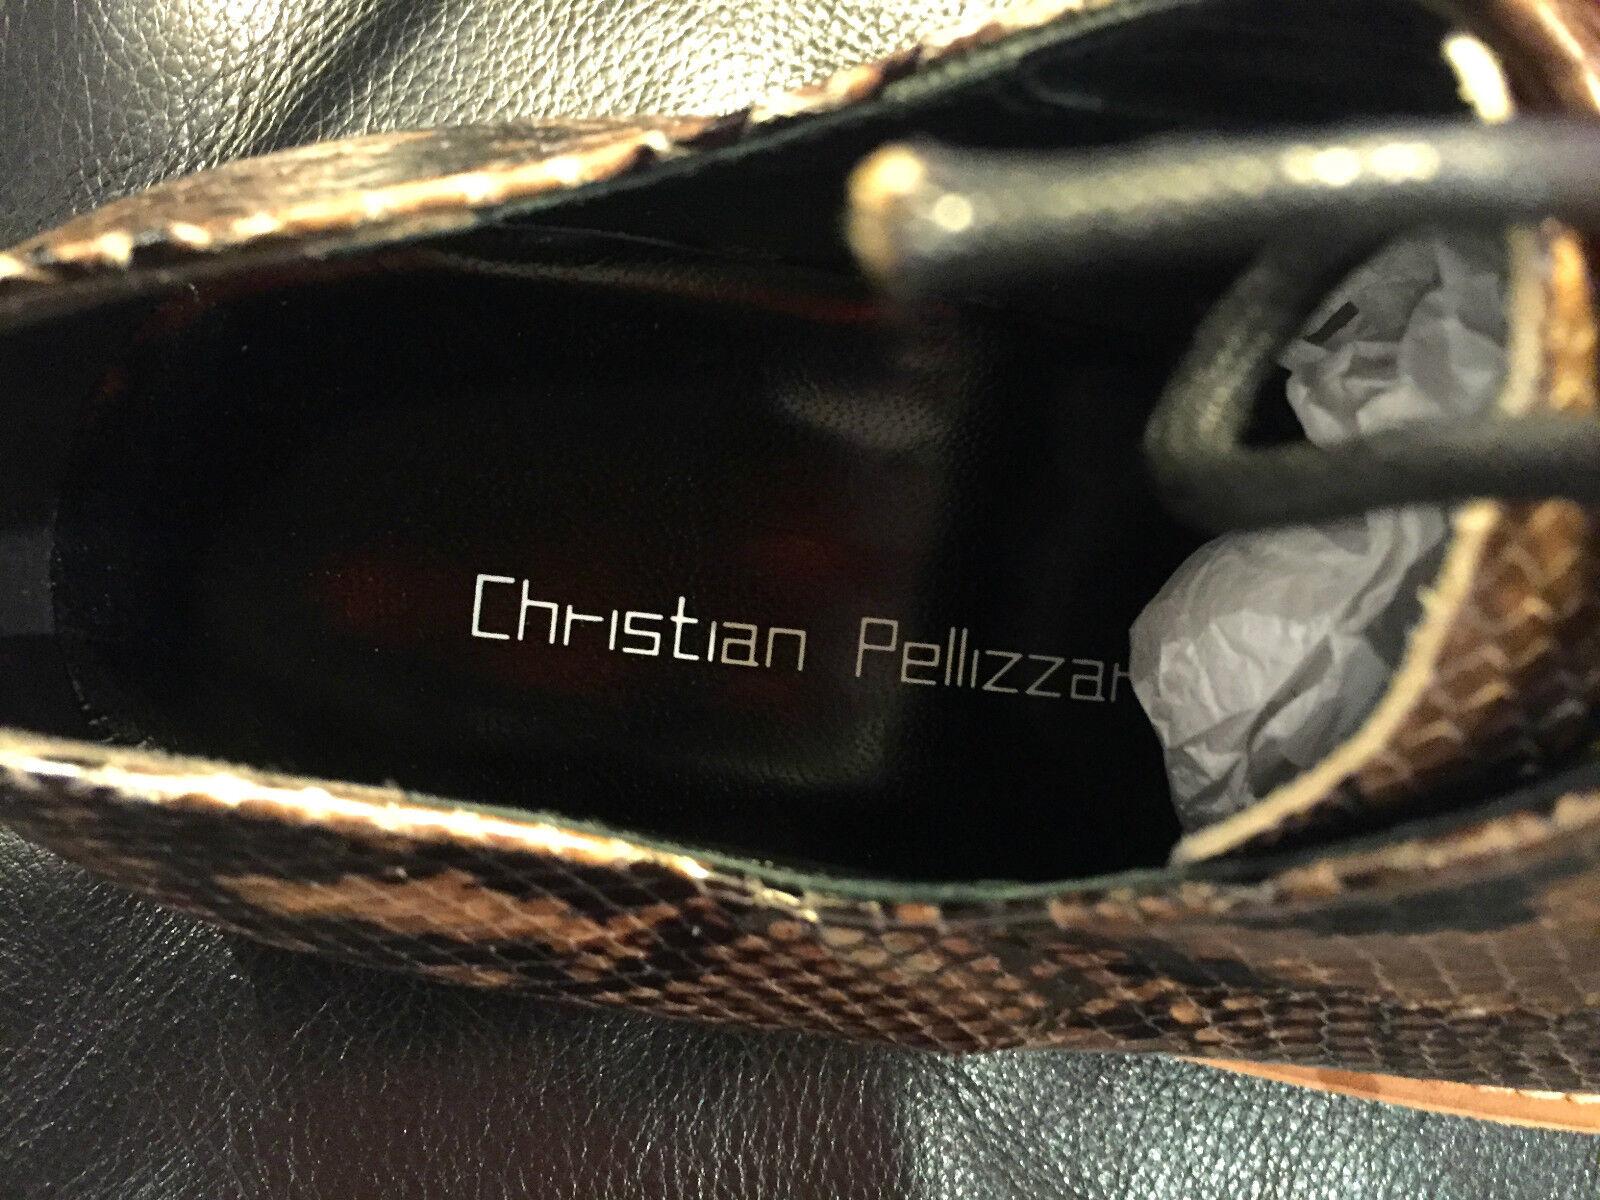 NEW CHRISTIAN PELLIZZARI PYTHON PRINT DERBY VIBRAM SOLE RUBBER SOLE VIBRAM M/ITALY SIZE 40/7 ddbbd9